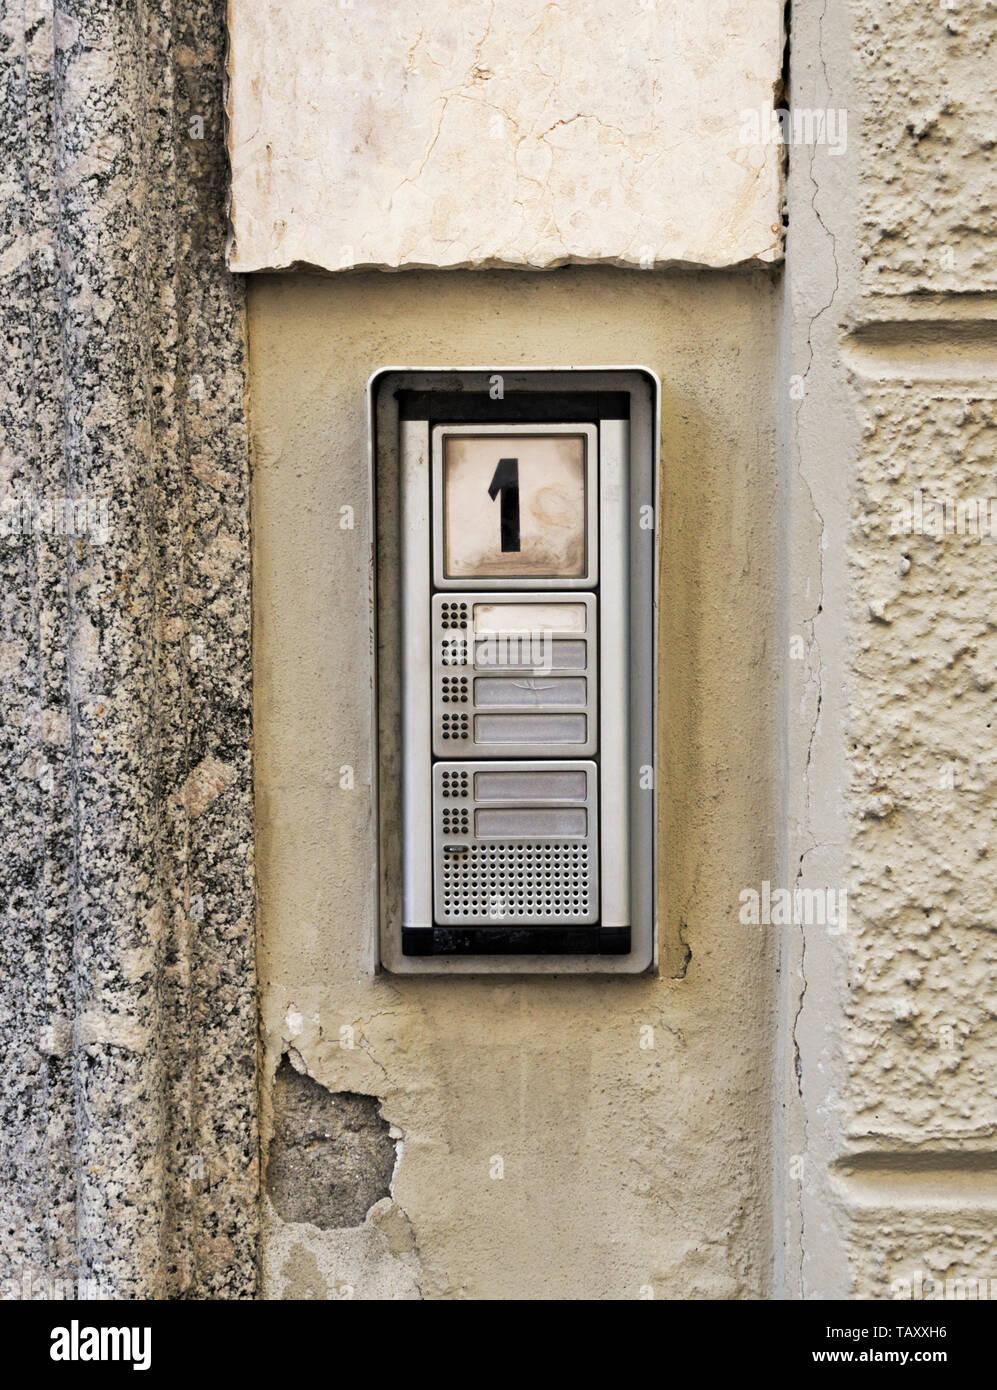 Tür-buzzer einer Hausnummer 1, Italien Stockbild